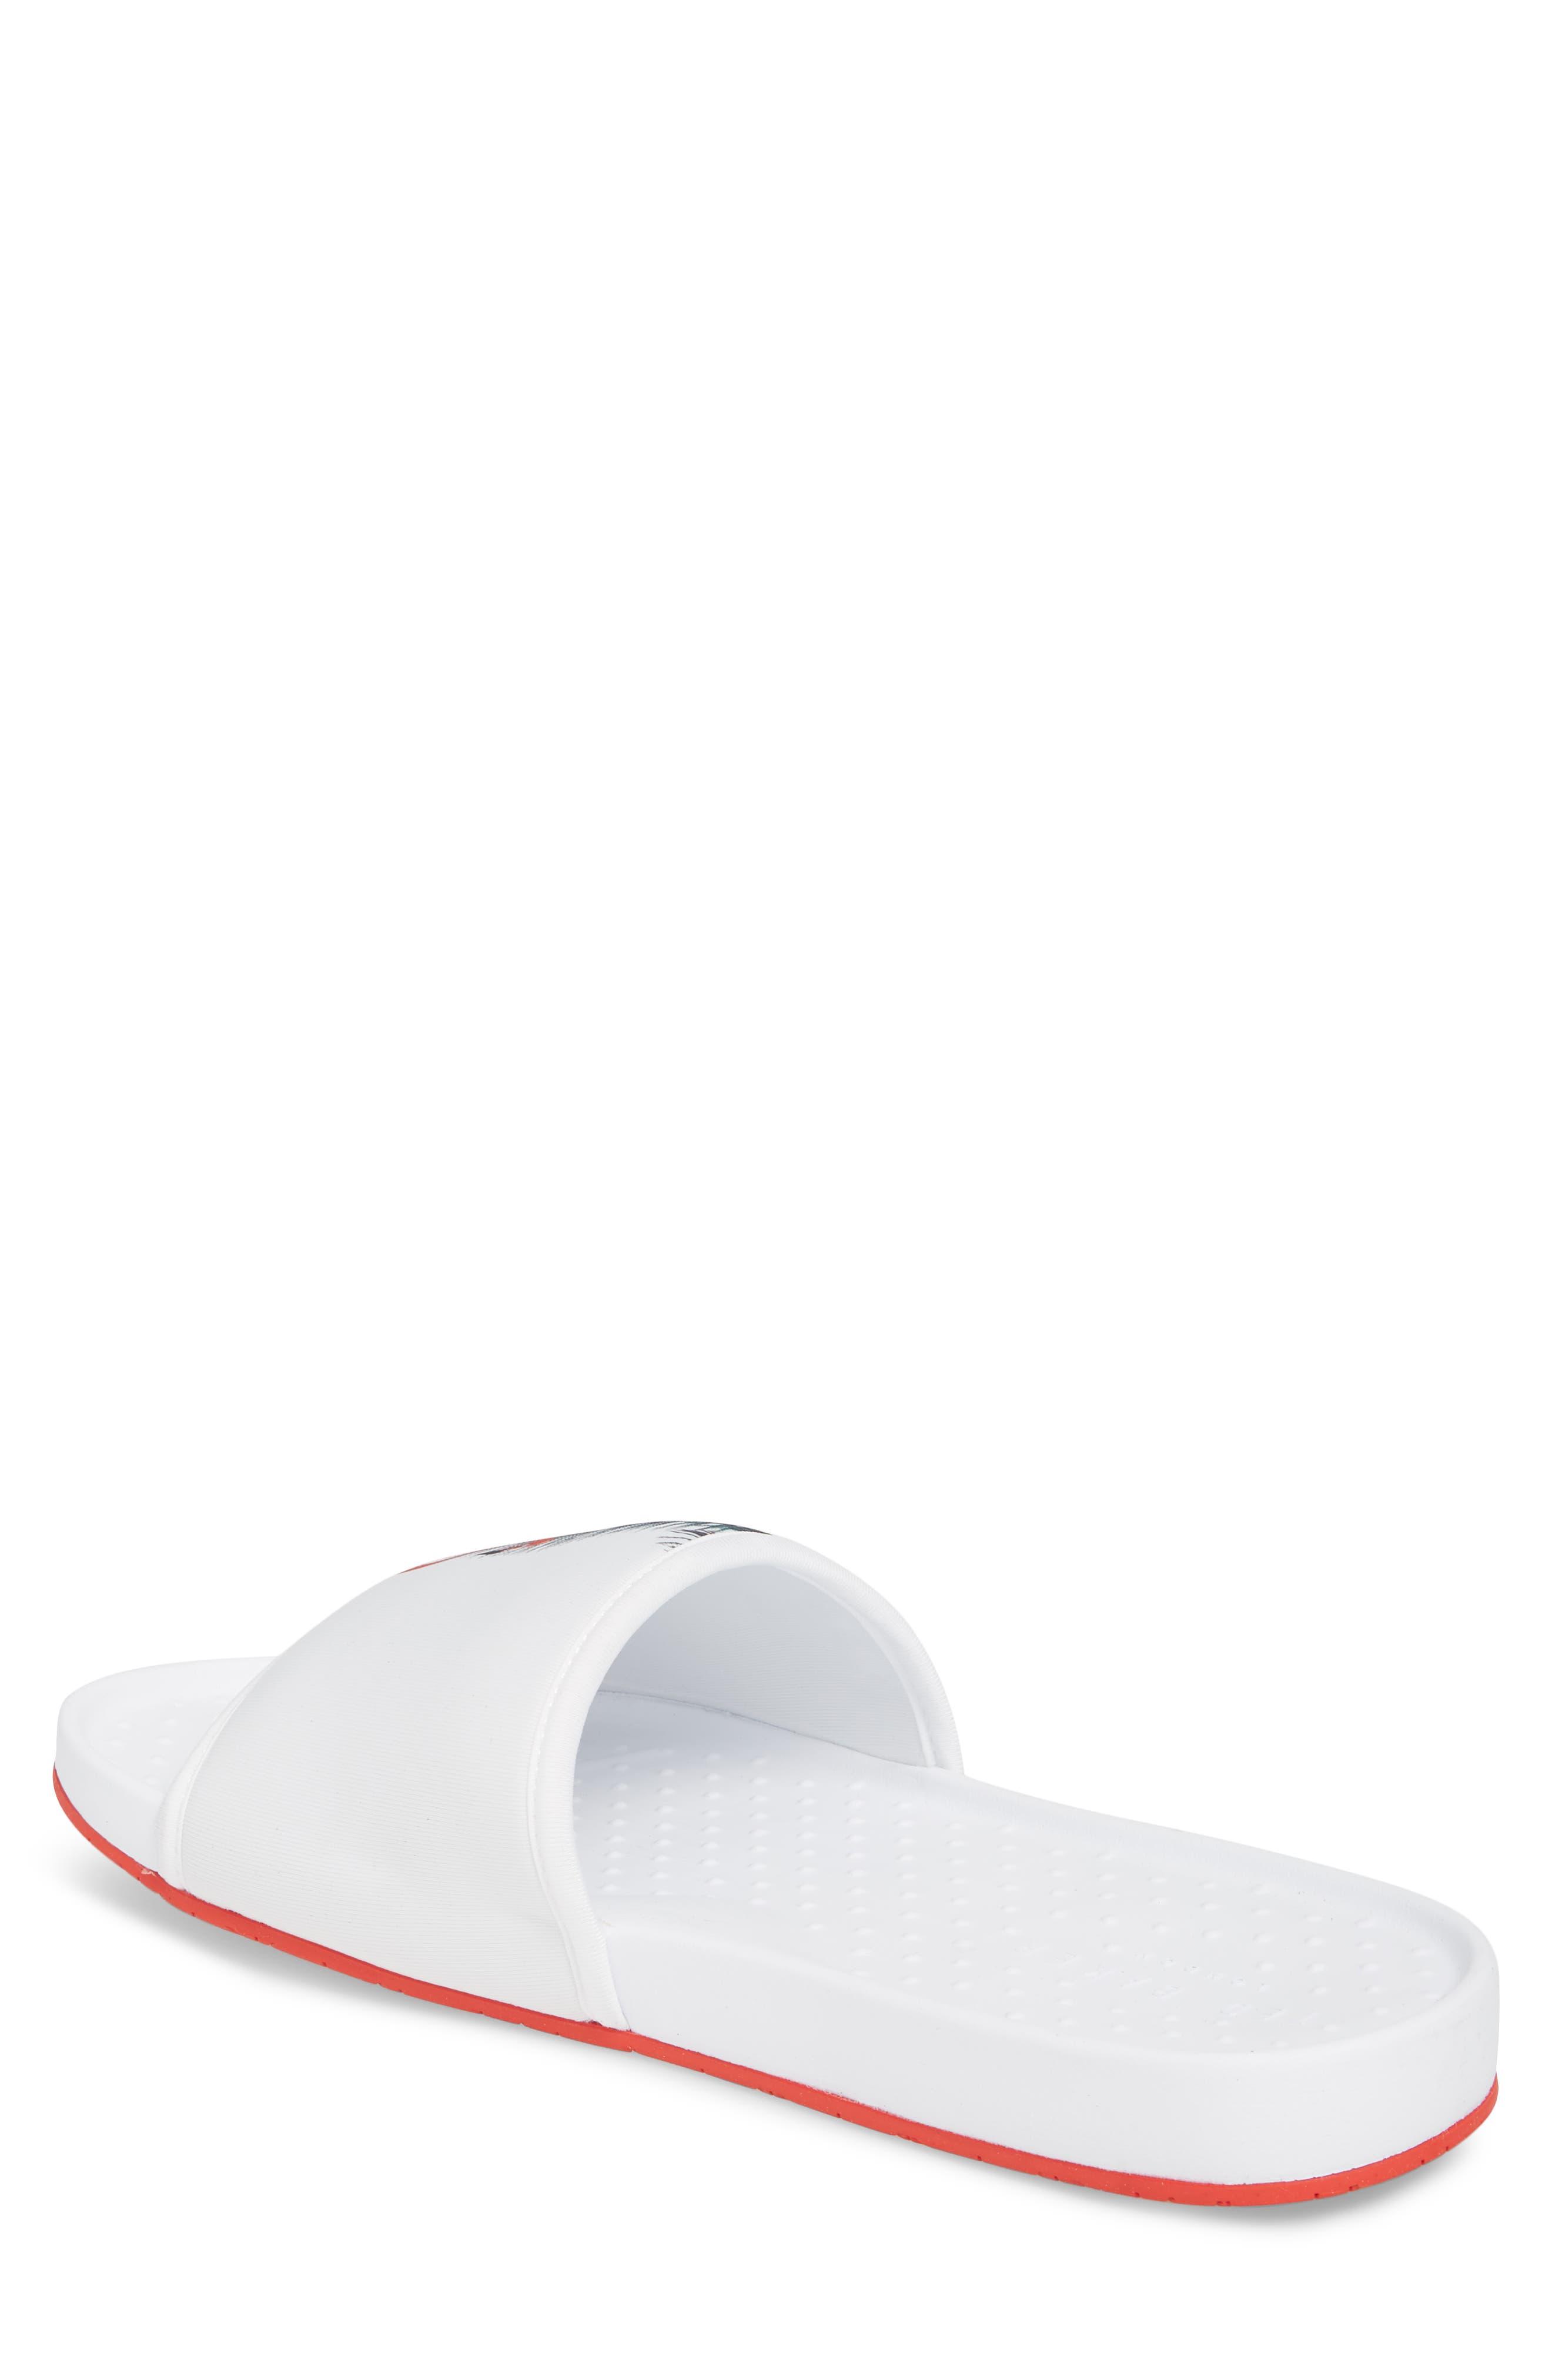 Sauldi 2 Slide Sandal,                             Alternate thumbnail 2, color,                             White/ Red Textile